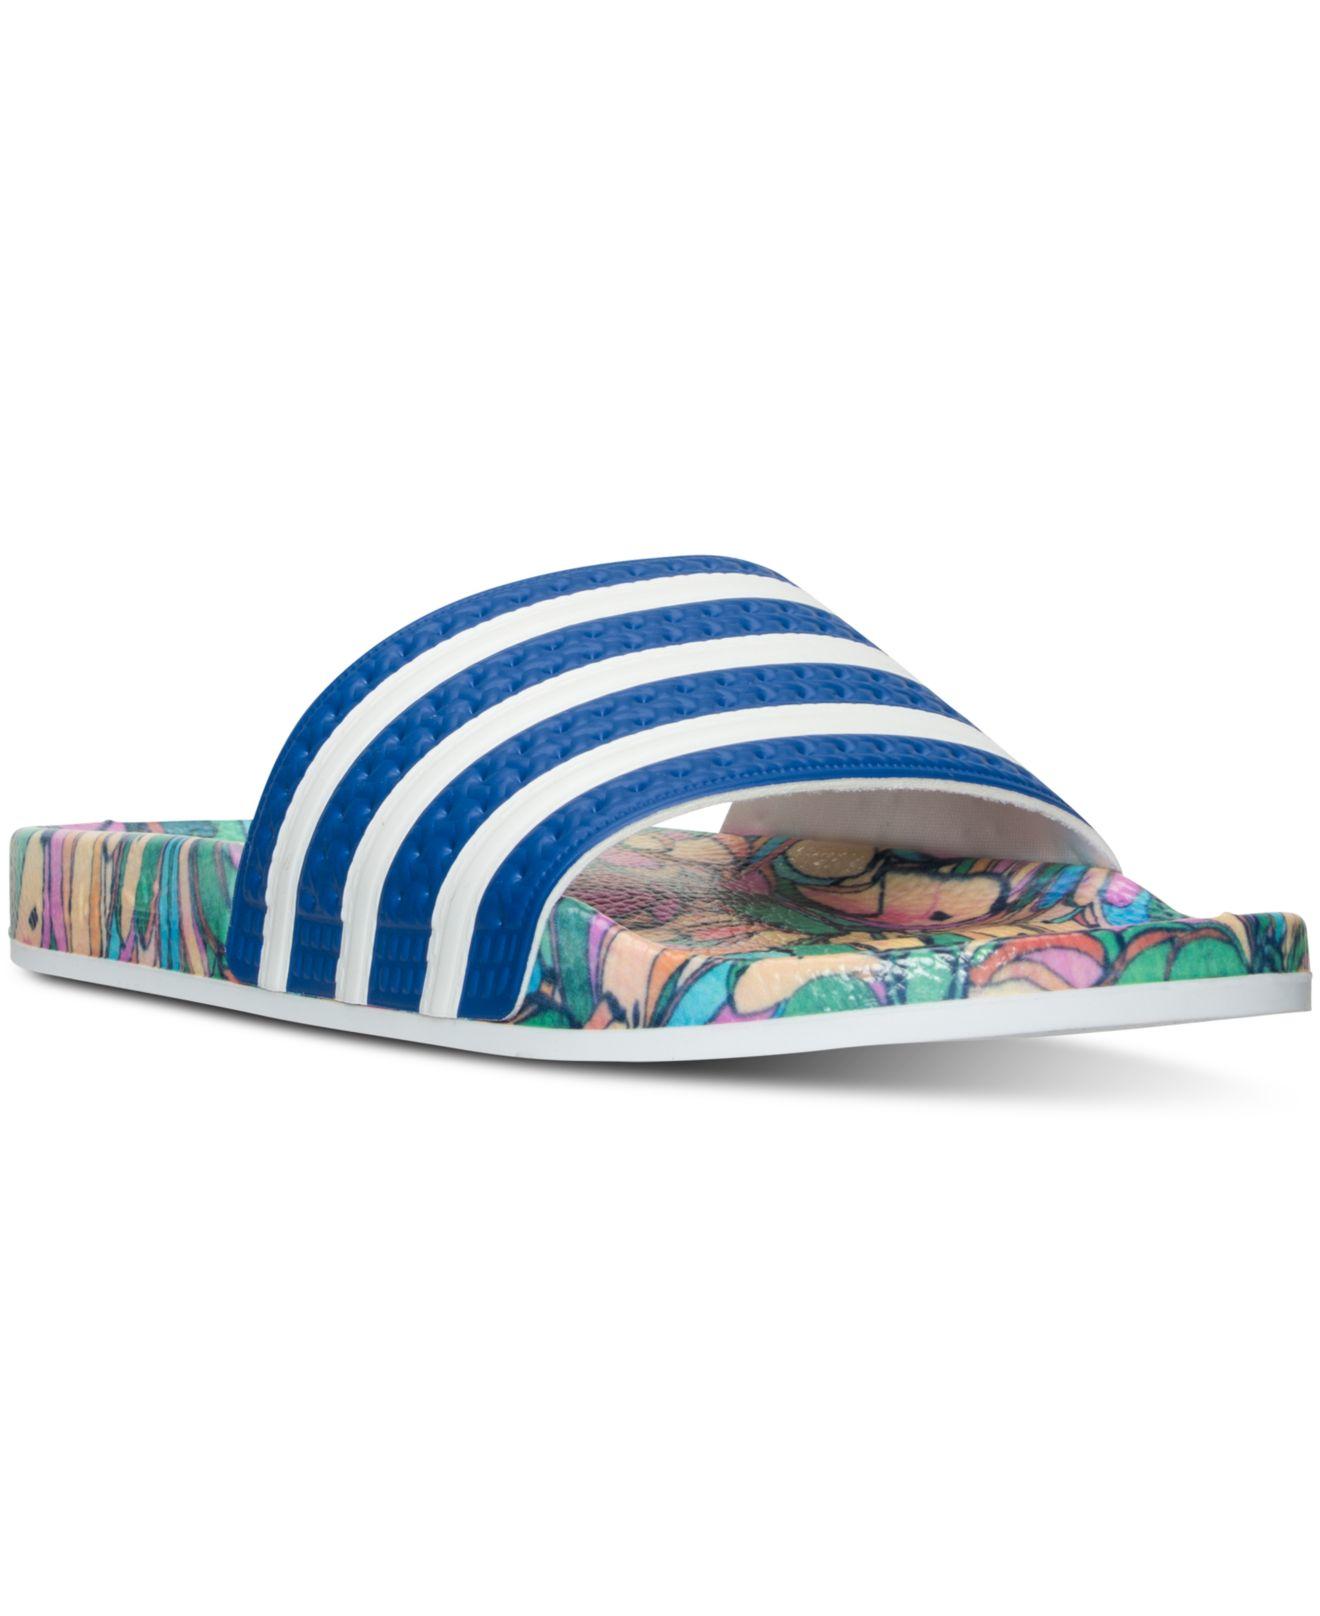 2955d1825edb Lyst - adidas Originals Women s Adilette Farm Slide Sandals From ...